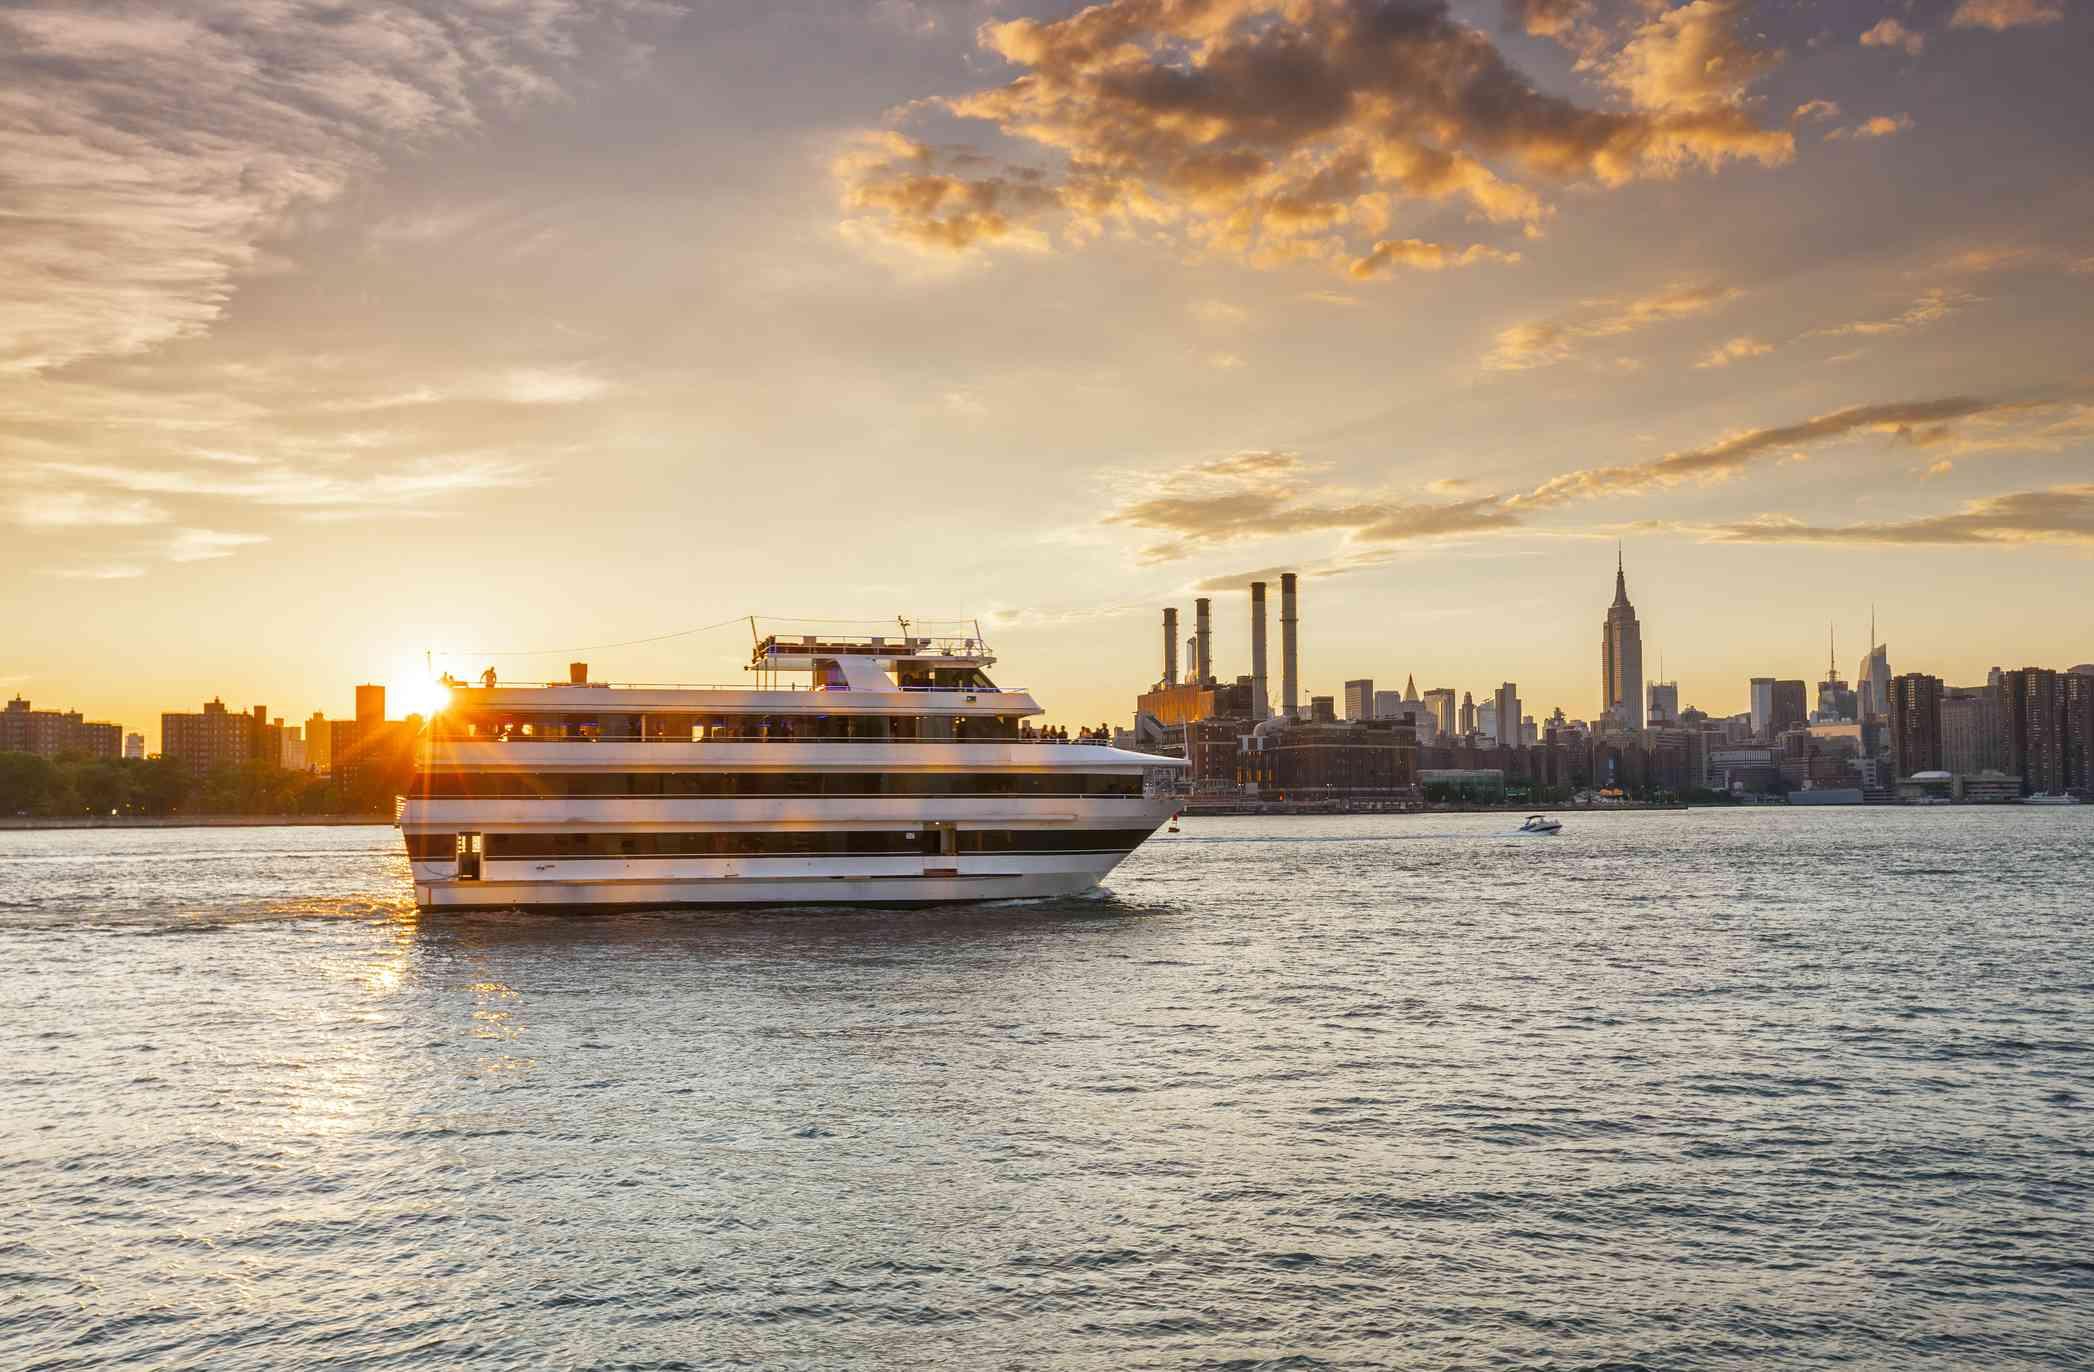 Cruise ship against New York City skyline at sunset